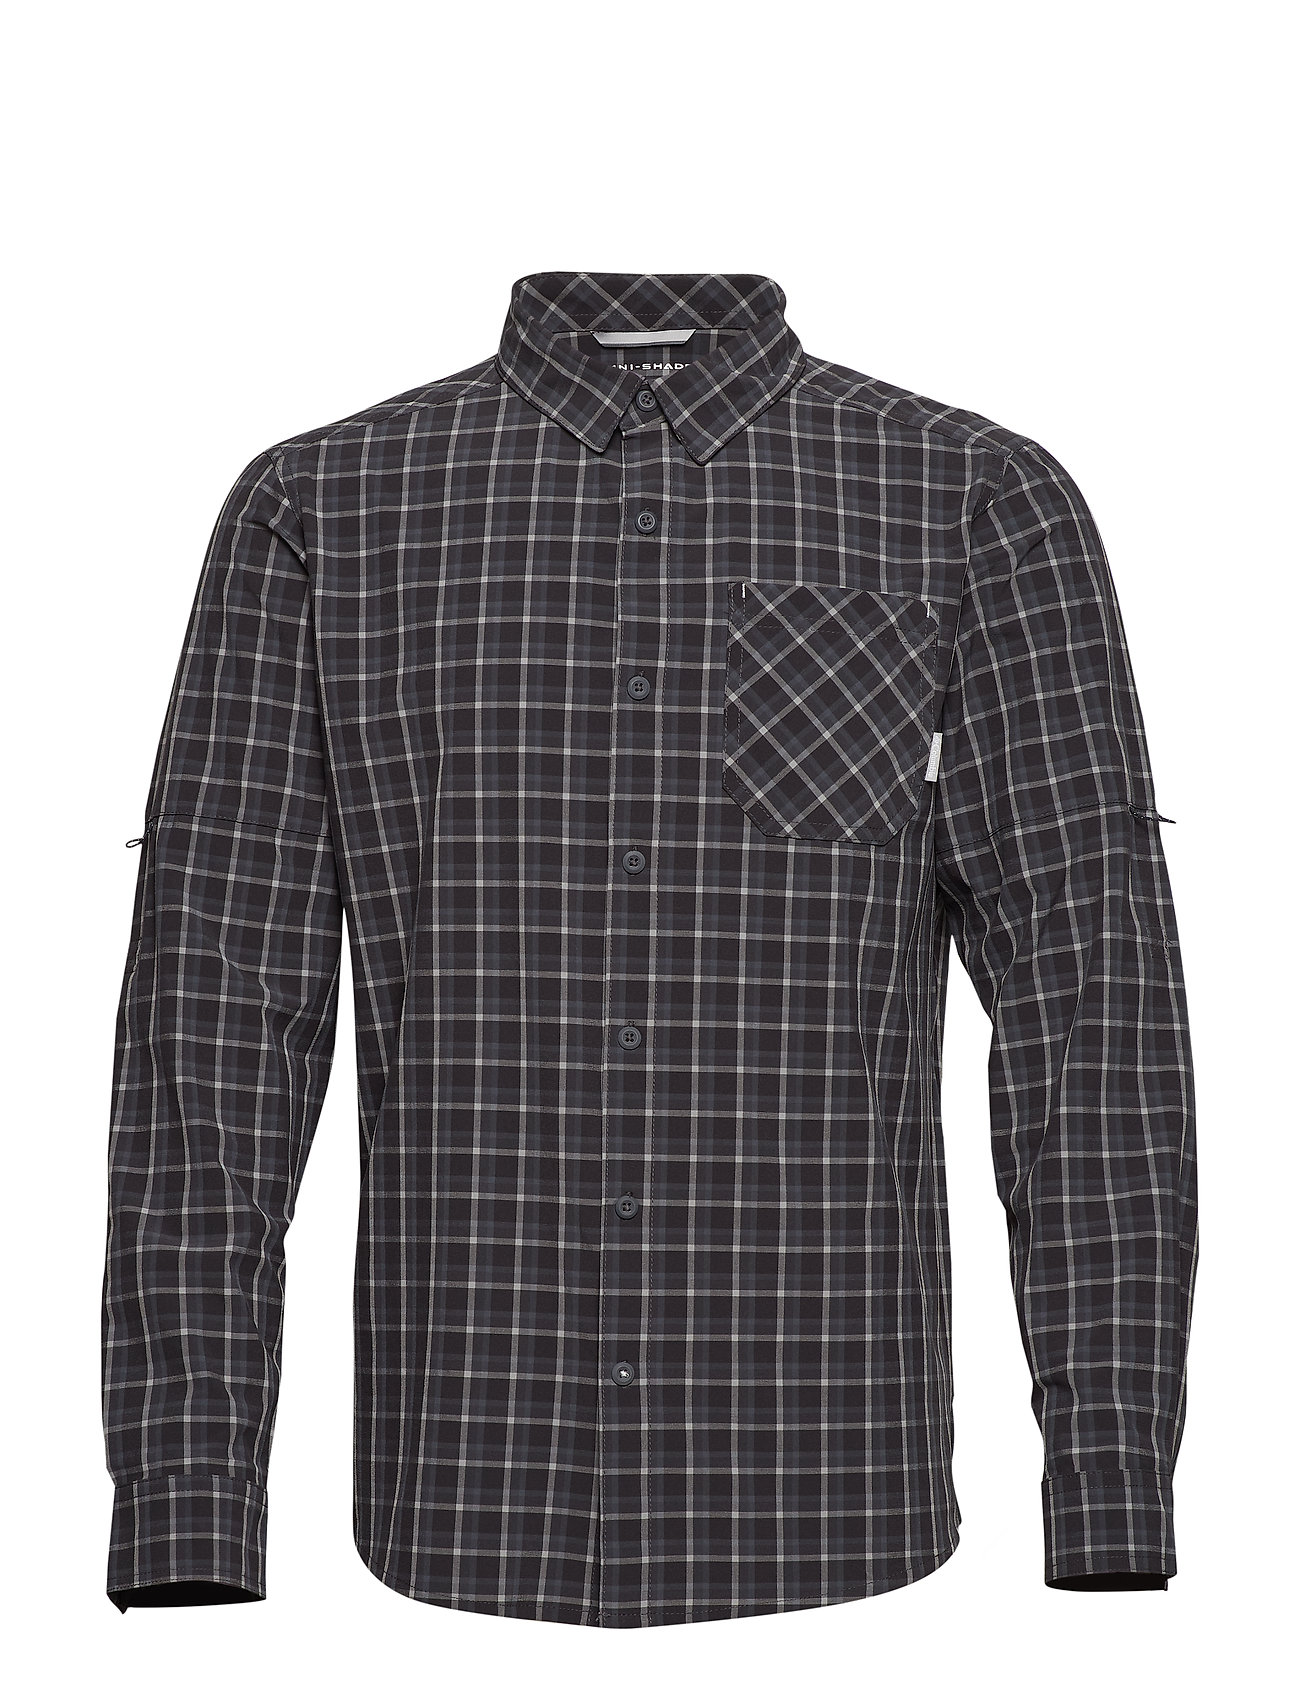 Columbia Triple Canyon™ Long Sleeve Shirt - SHARK, GRAPHITE